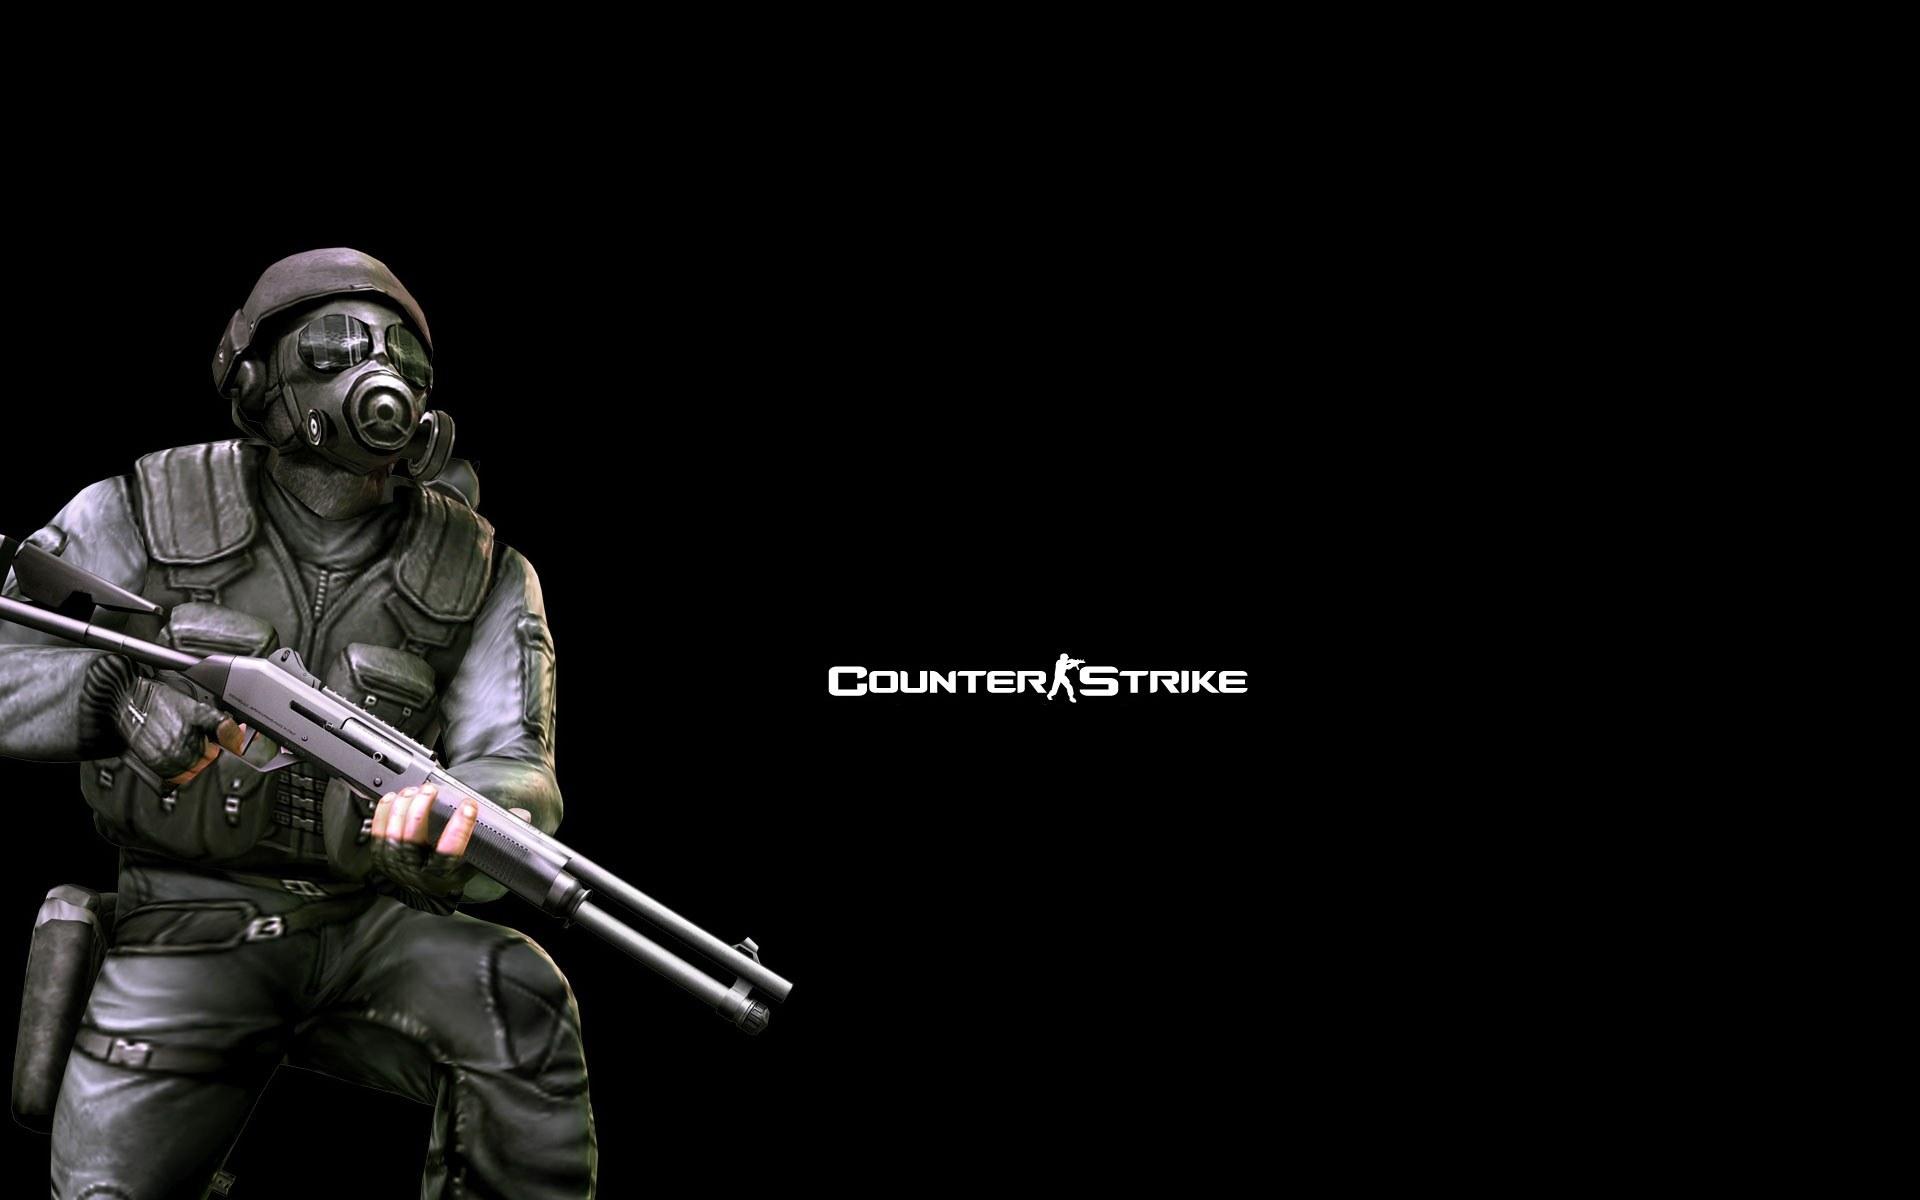 counter strike wallpaper 1080p